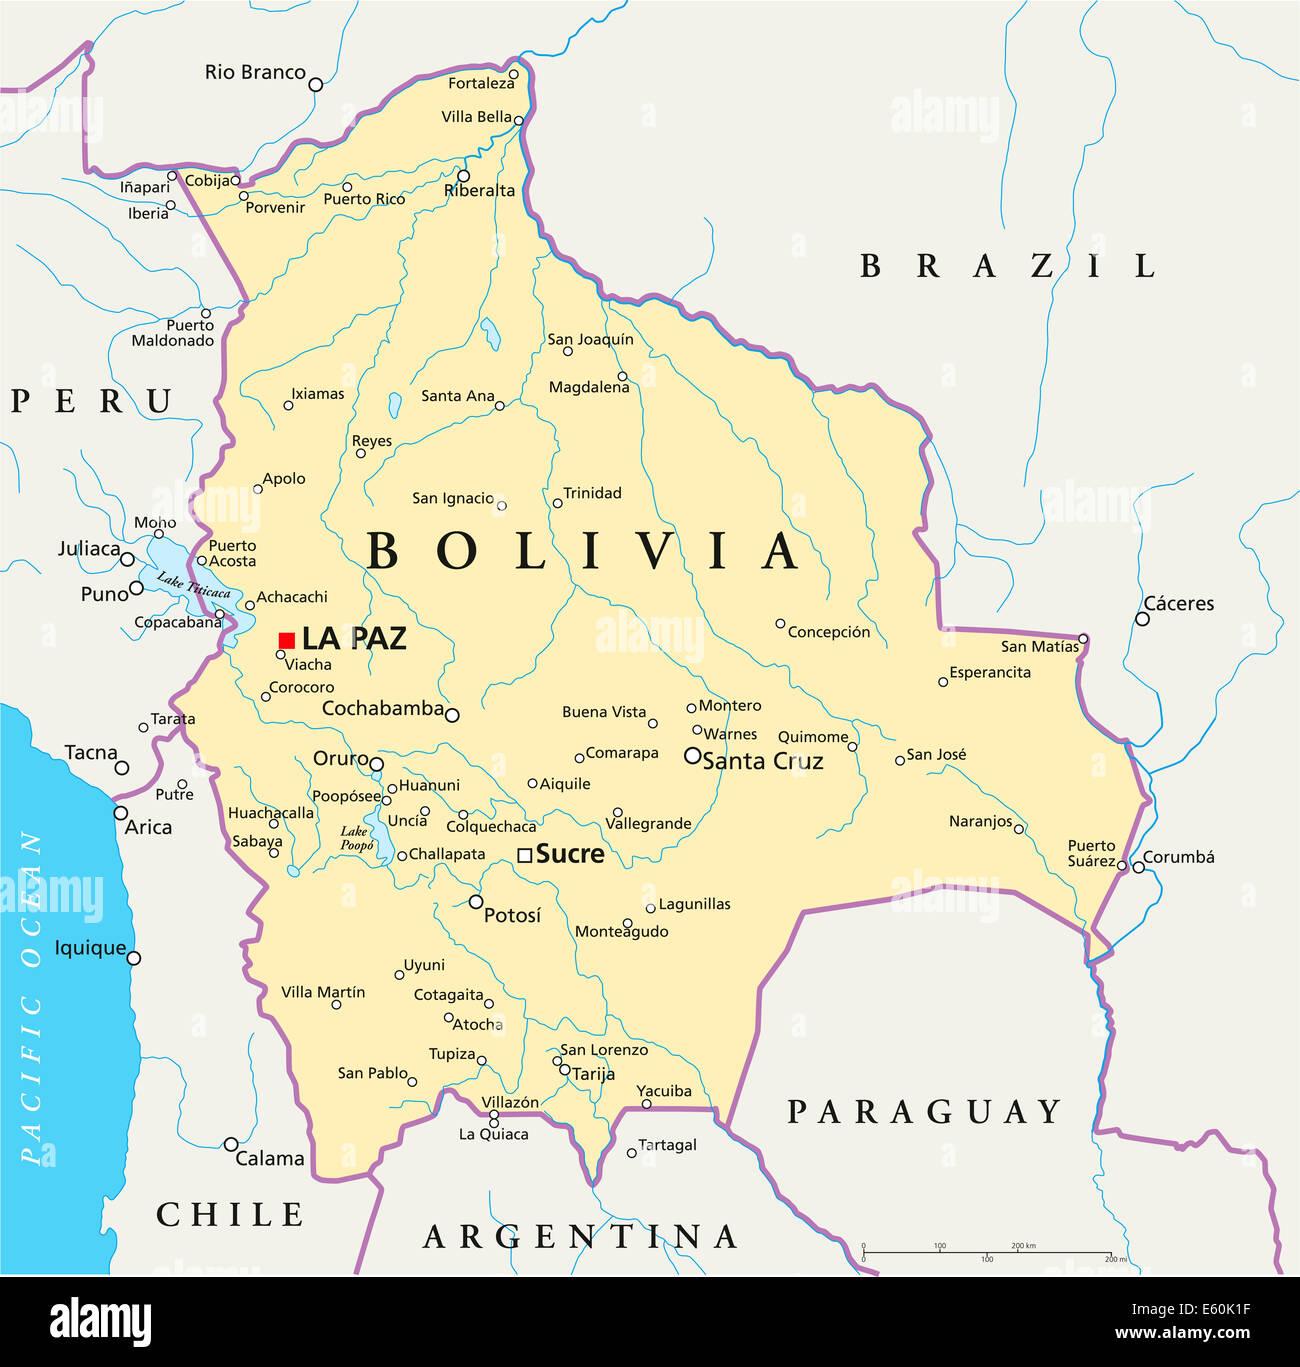 bolivien karte Bolivien politische Karte Stockfoto, Bild: 72544347   Alamy